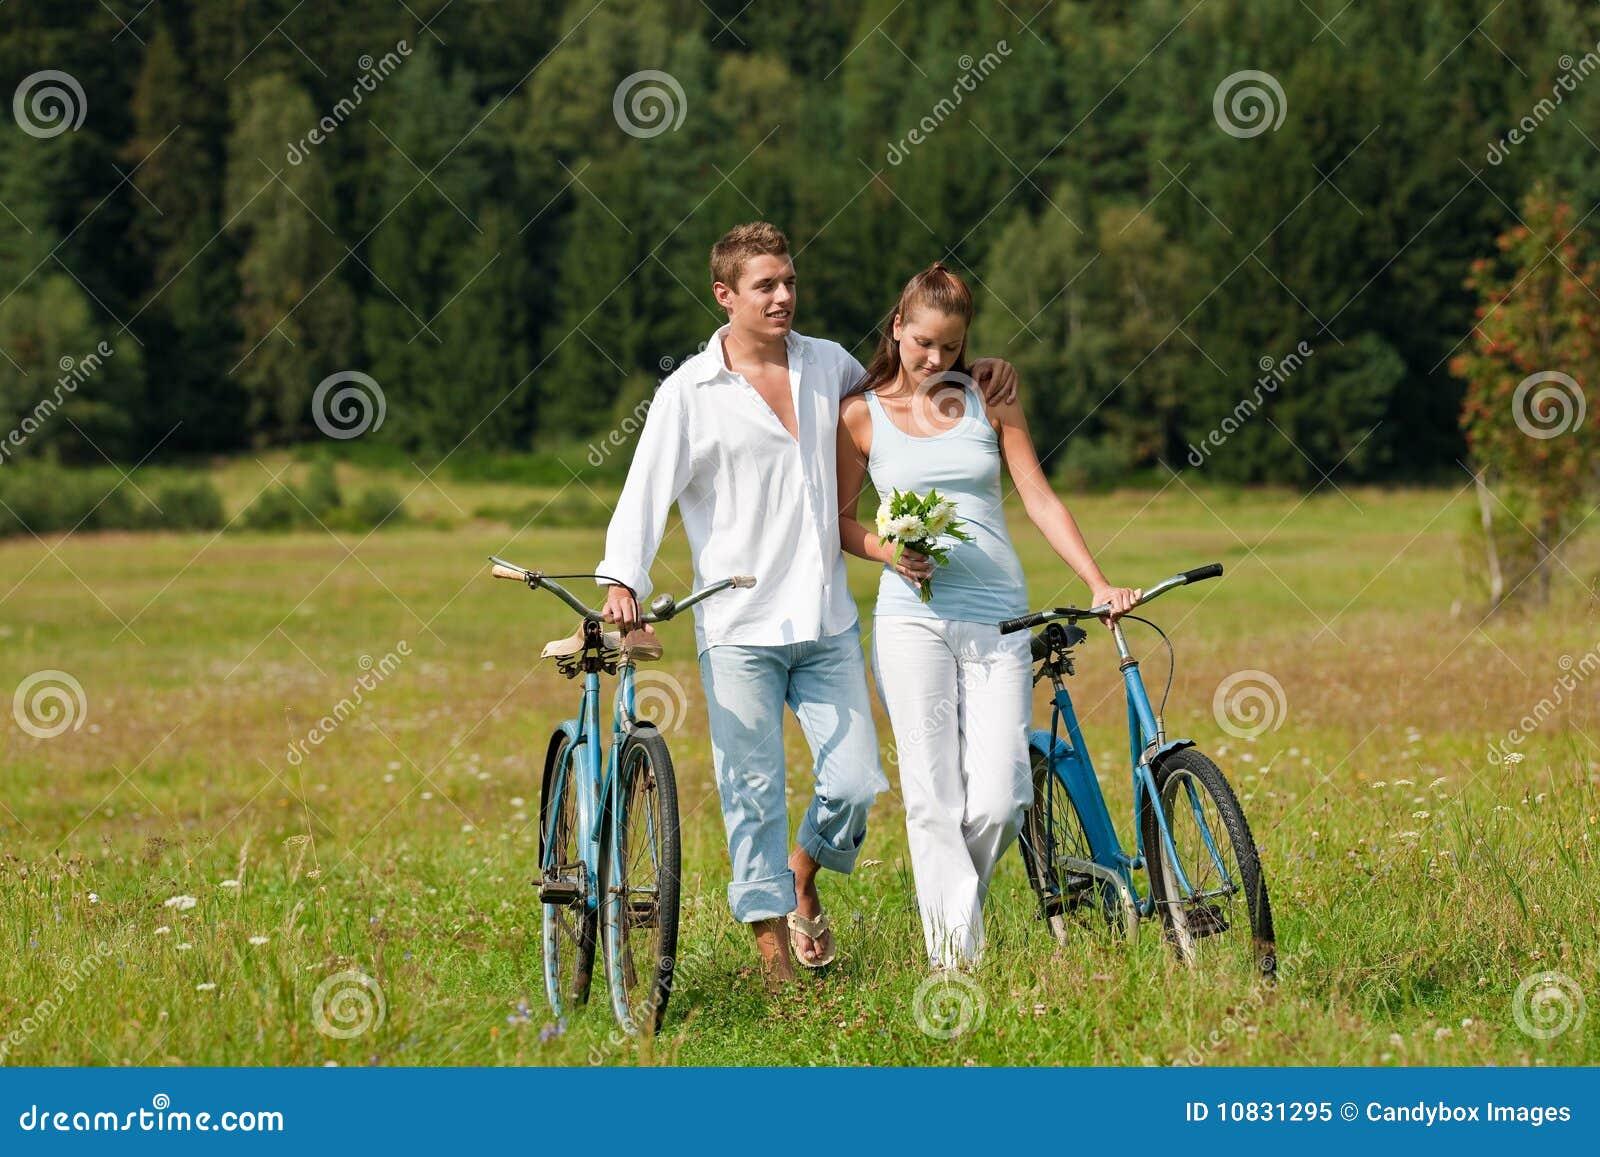 Outdoor Weddings at Meadow Brook